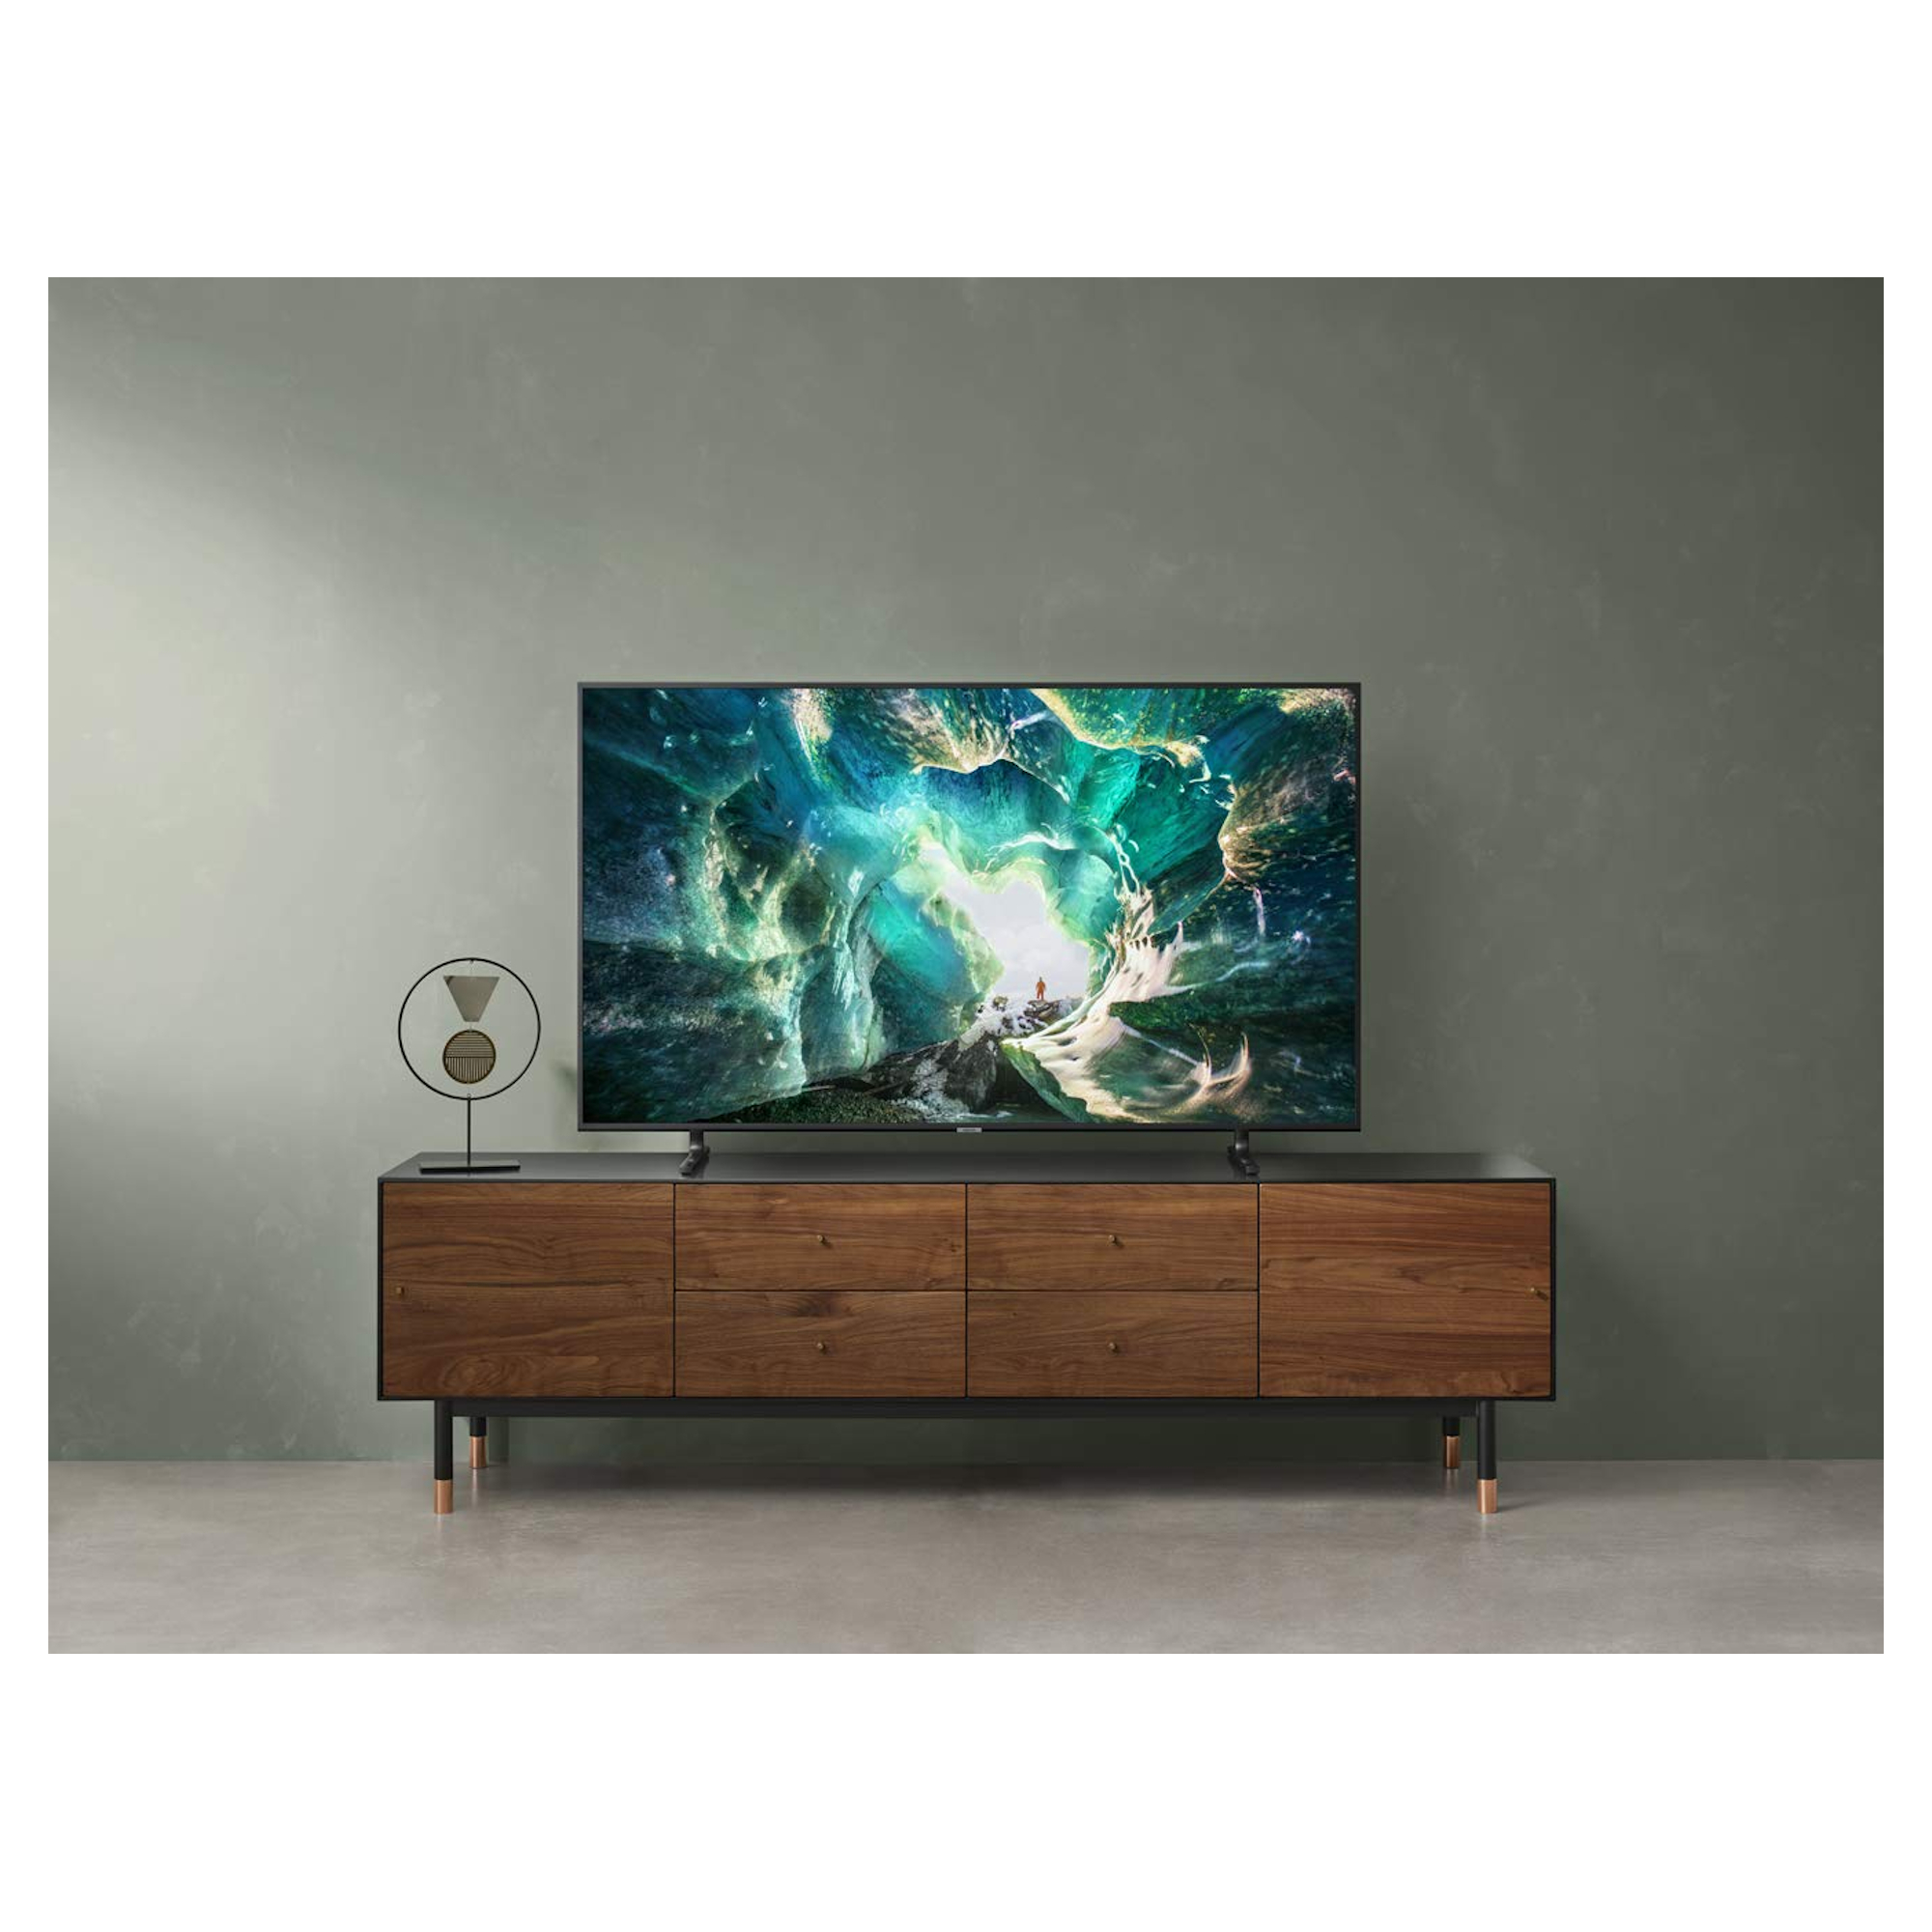 Samsung-UE49RU8000TX-49-4K-TV-Smart-Ultra-HD-HDR-LED thumbnail 6